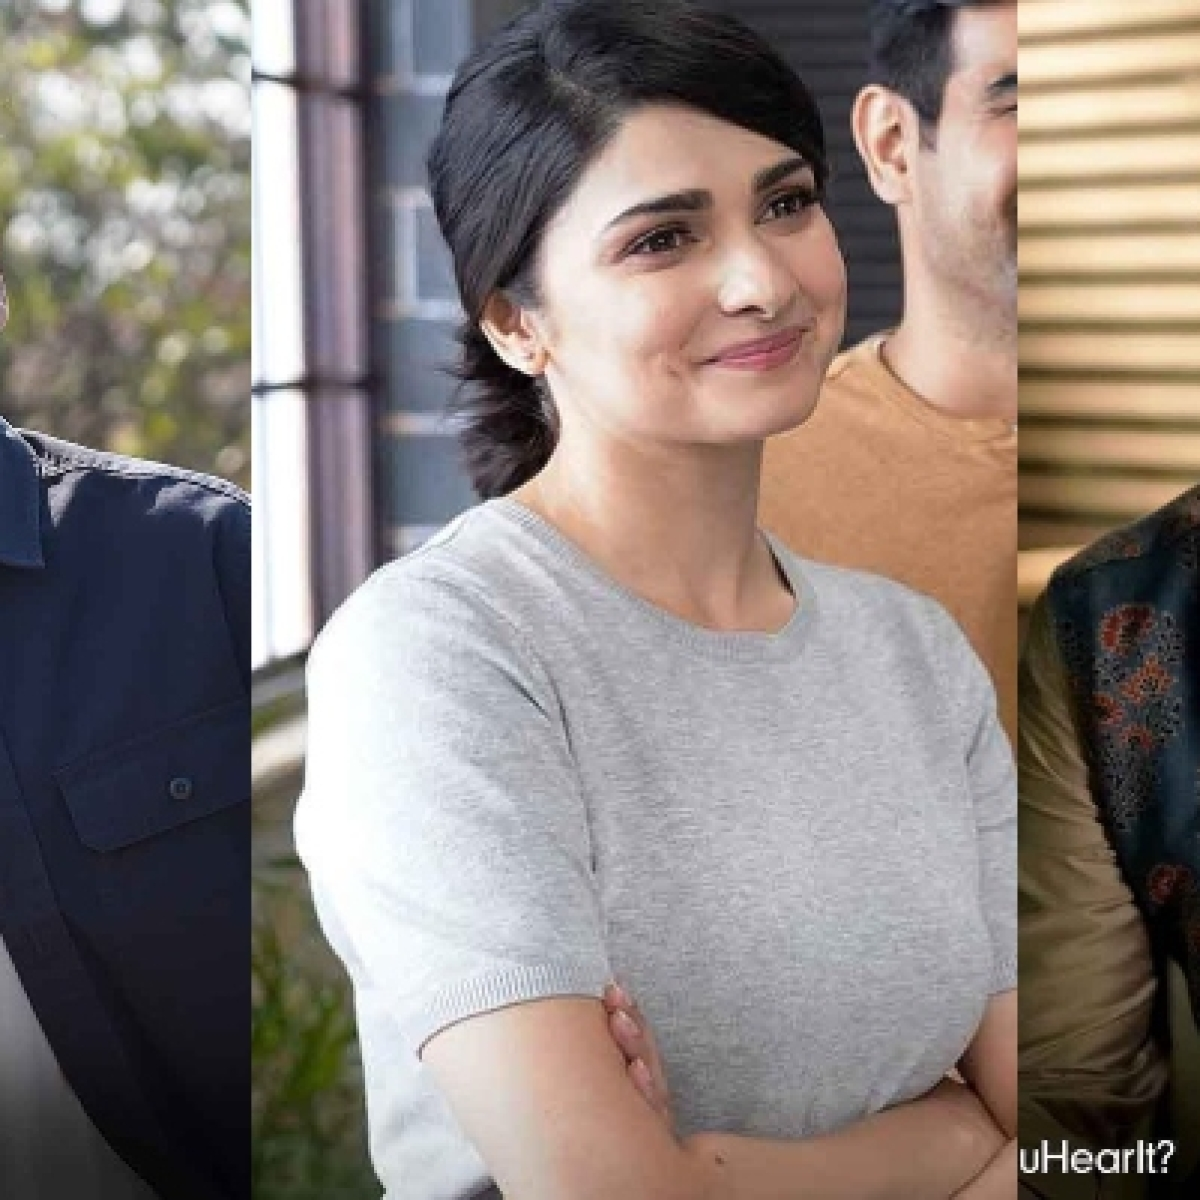 Manoj Bajpayee, Arjun Mathur and Prachi Desai to feature in ZEE5 original film 'Silence... Can You Hear It?'